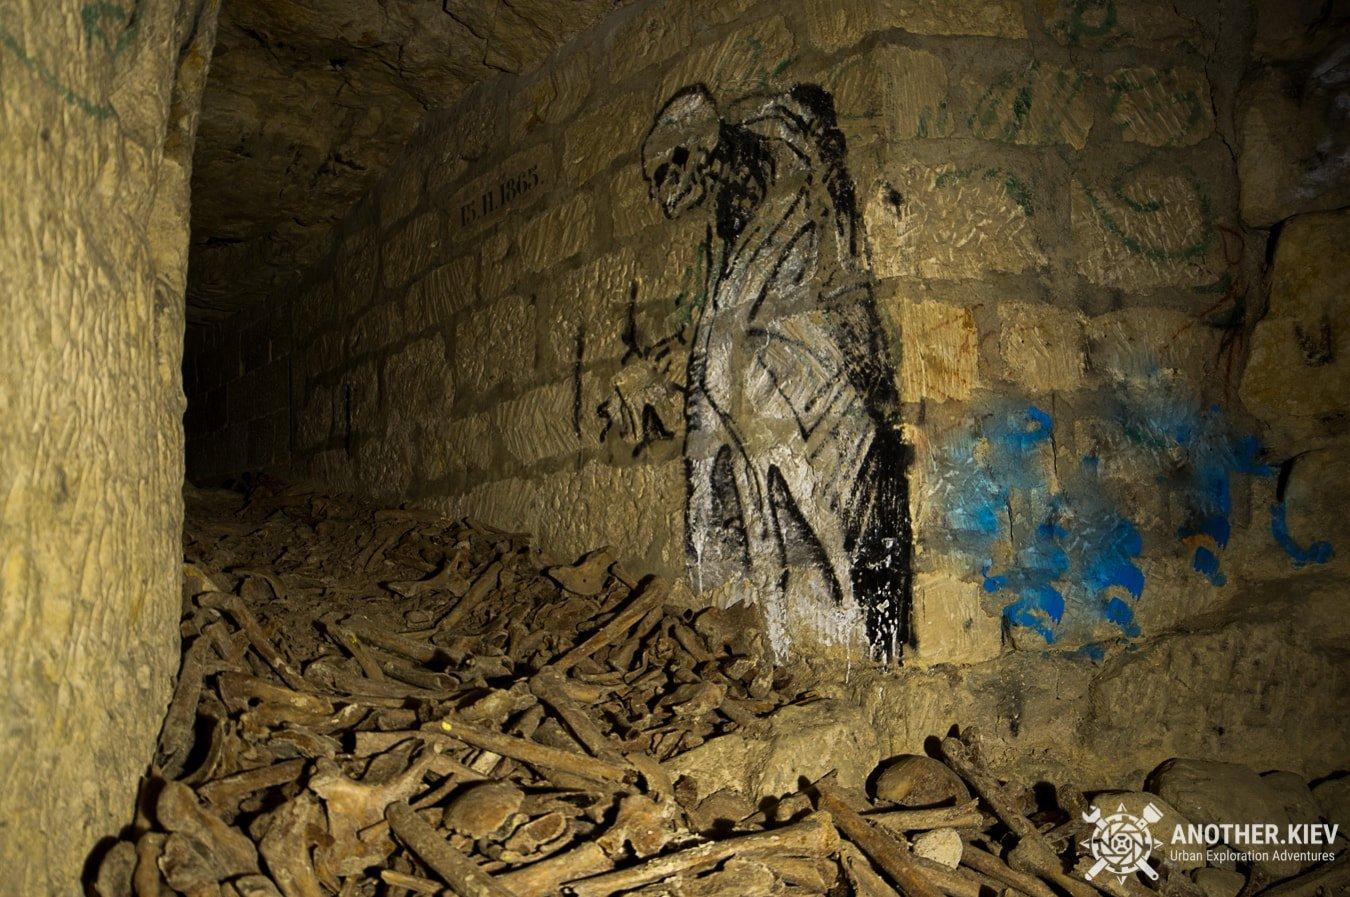 paris-catacombs-dark-urbex-tour-exploring-ossuarium PARIS CATACOMBS DARK TOUR